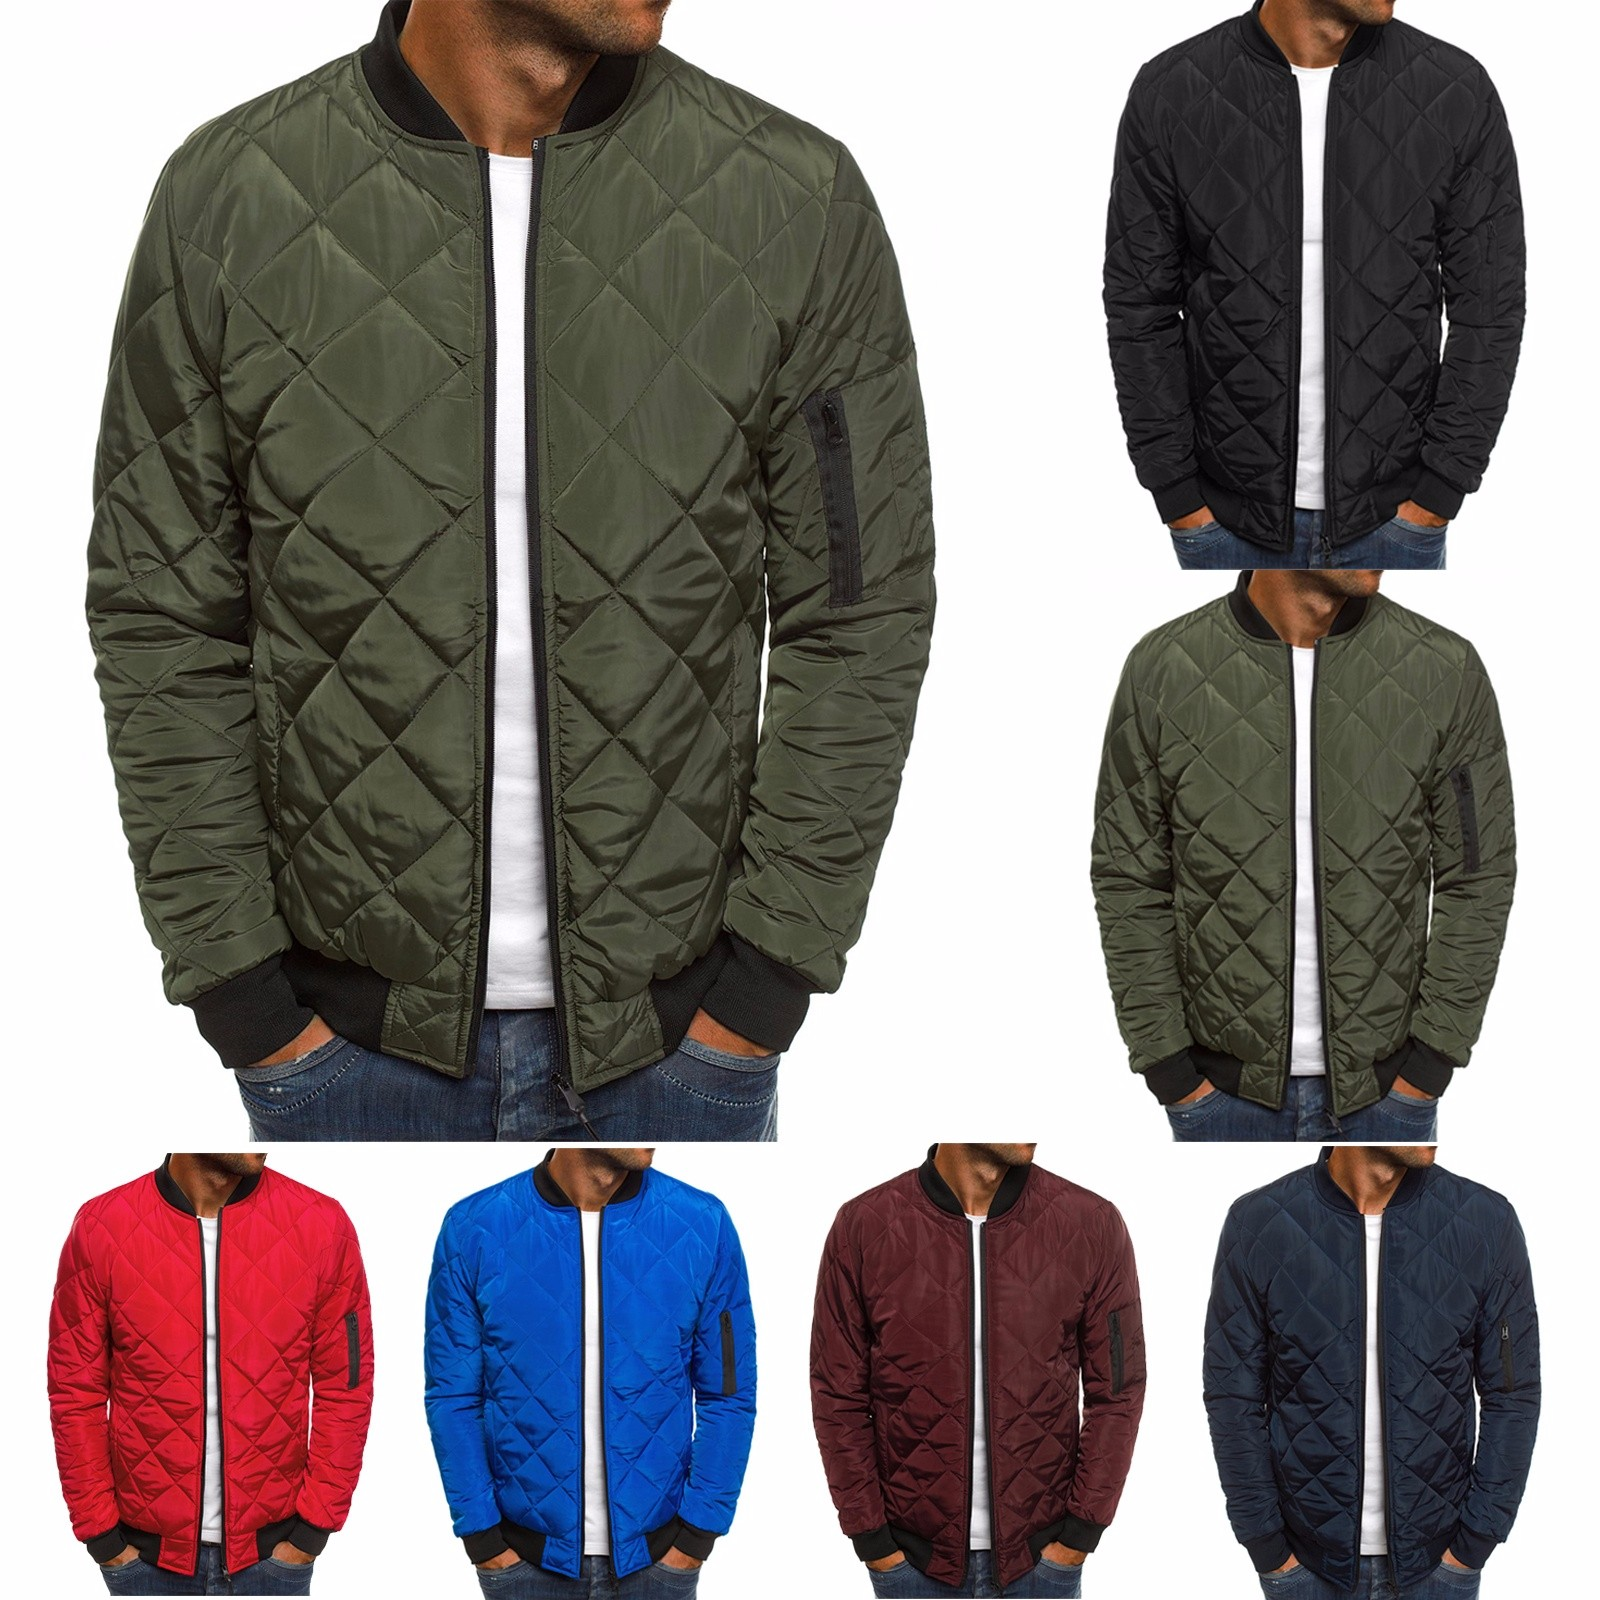 ZOGAA Men Autumn Jacket Wind Breaker Casual Plaid Parka Solid Color Brand Overcoat Men Thick Clothes Zipper Jackets Men 2019